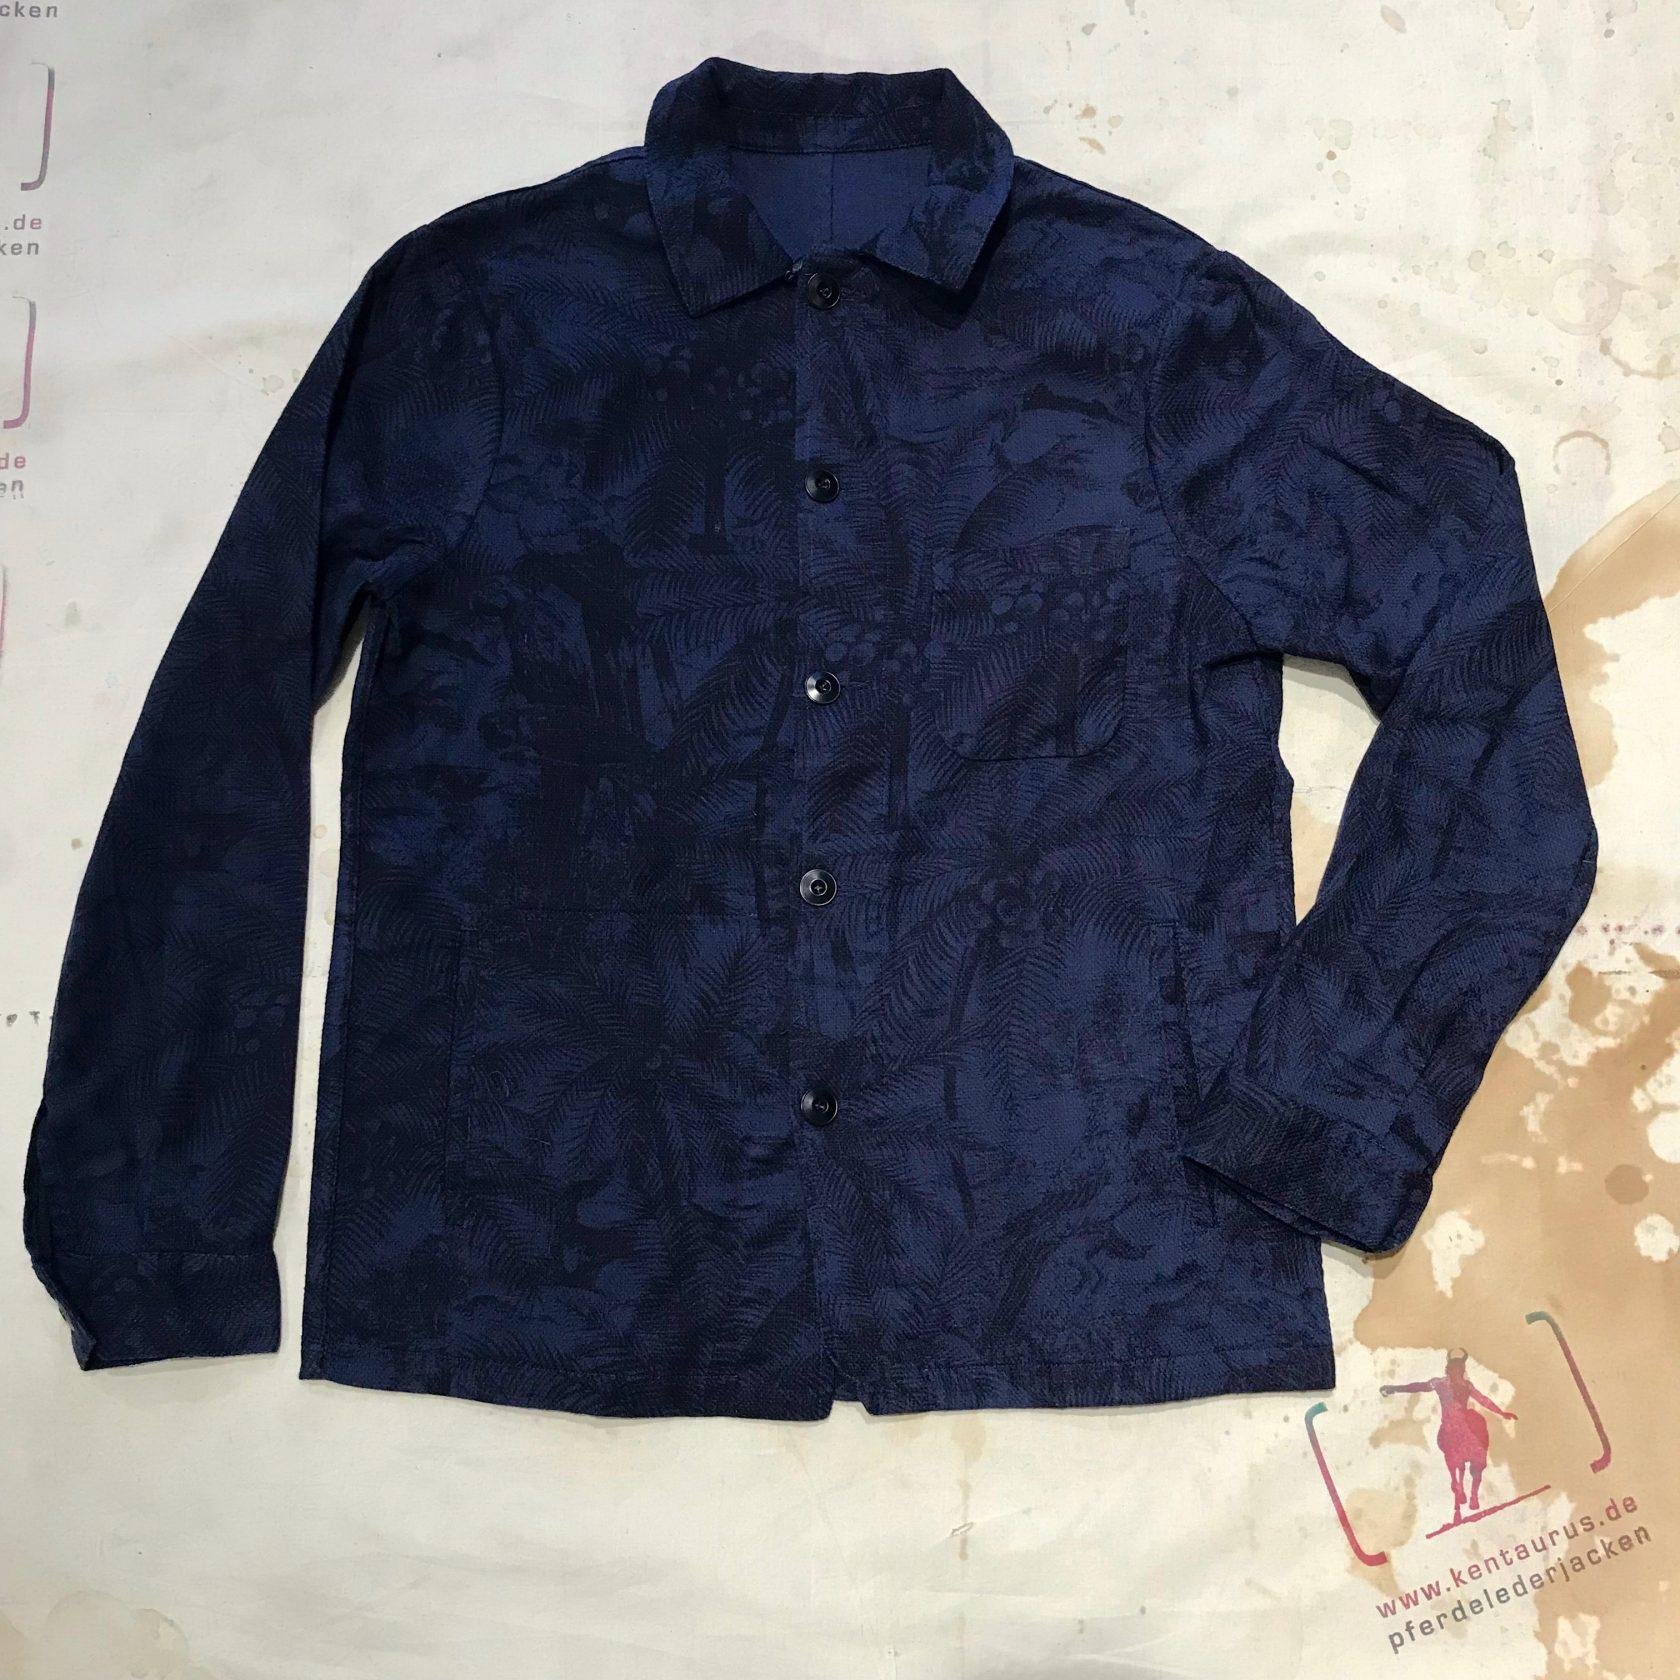 A.B.C.L. Japan service jacket co/li blue print